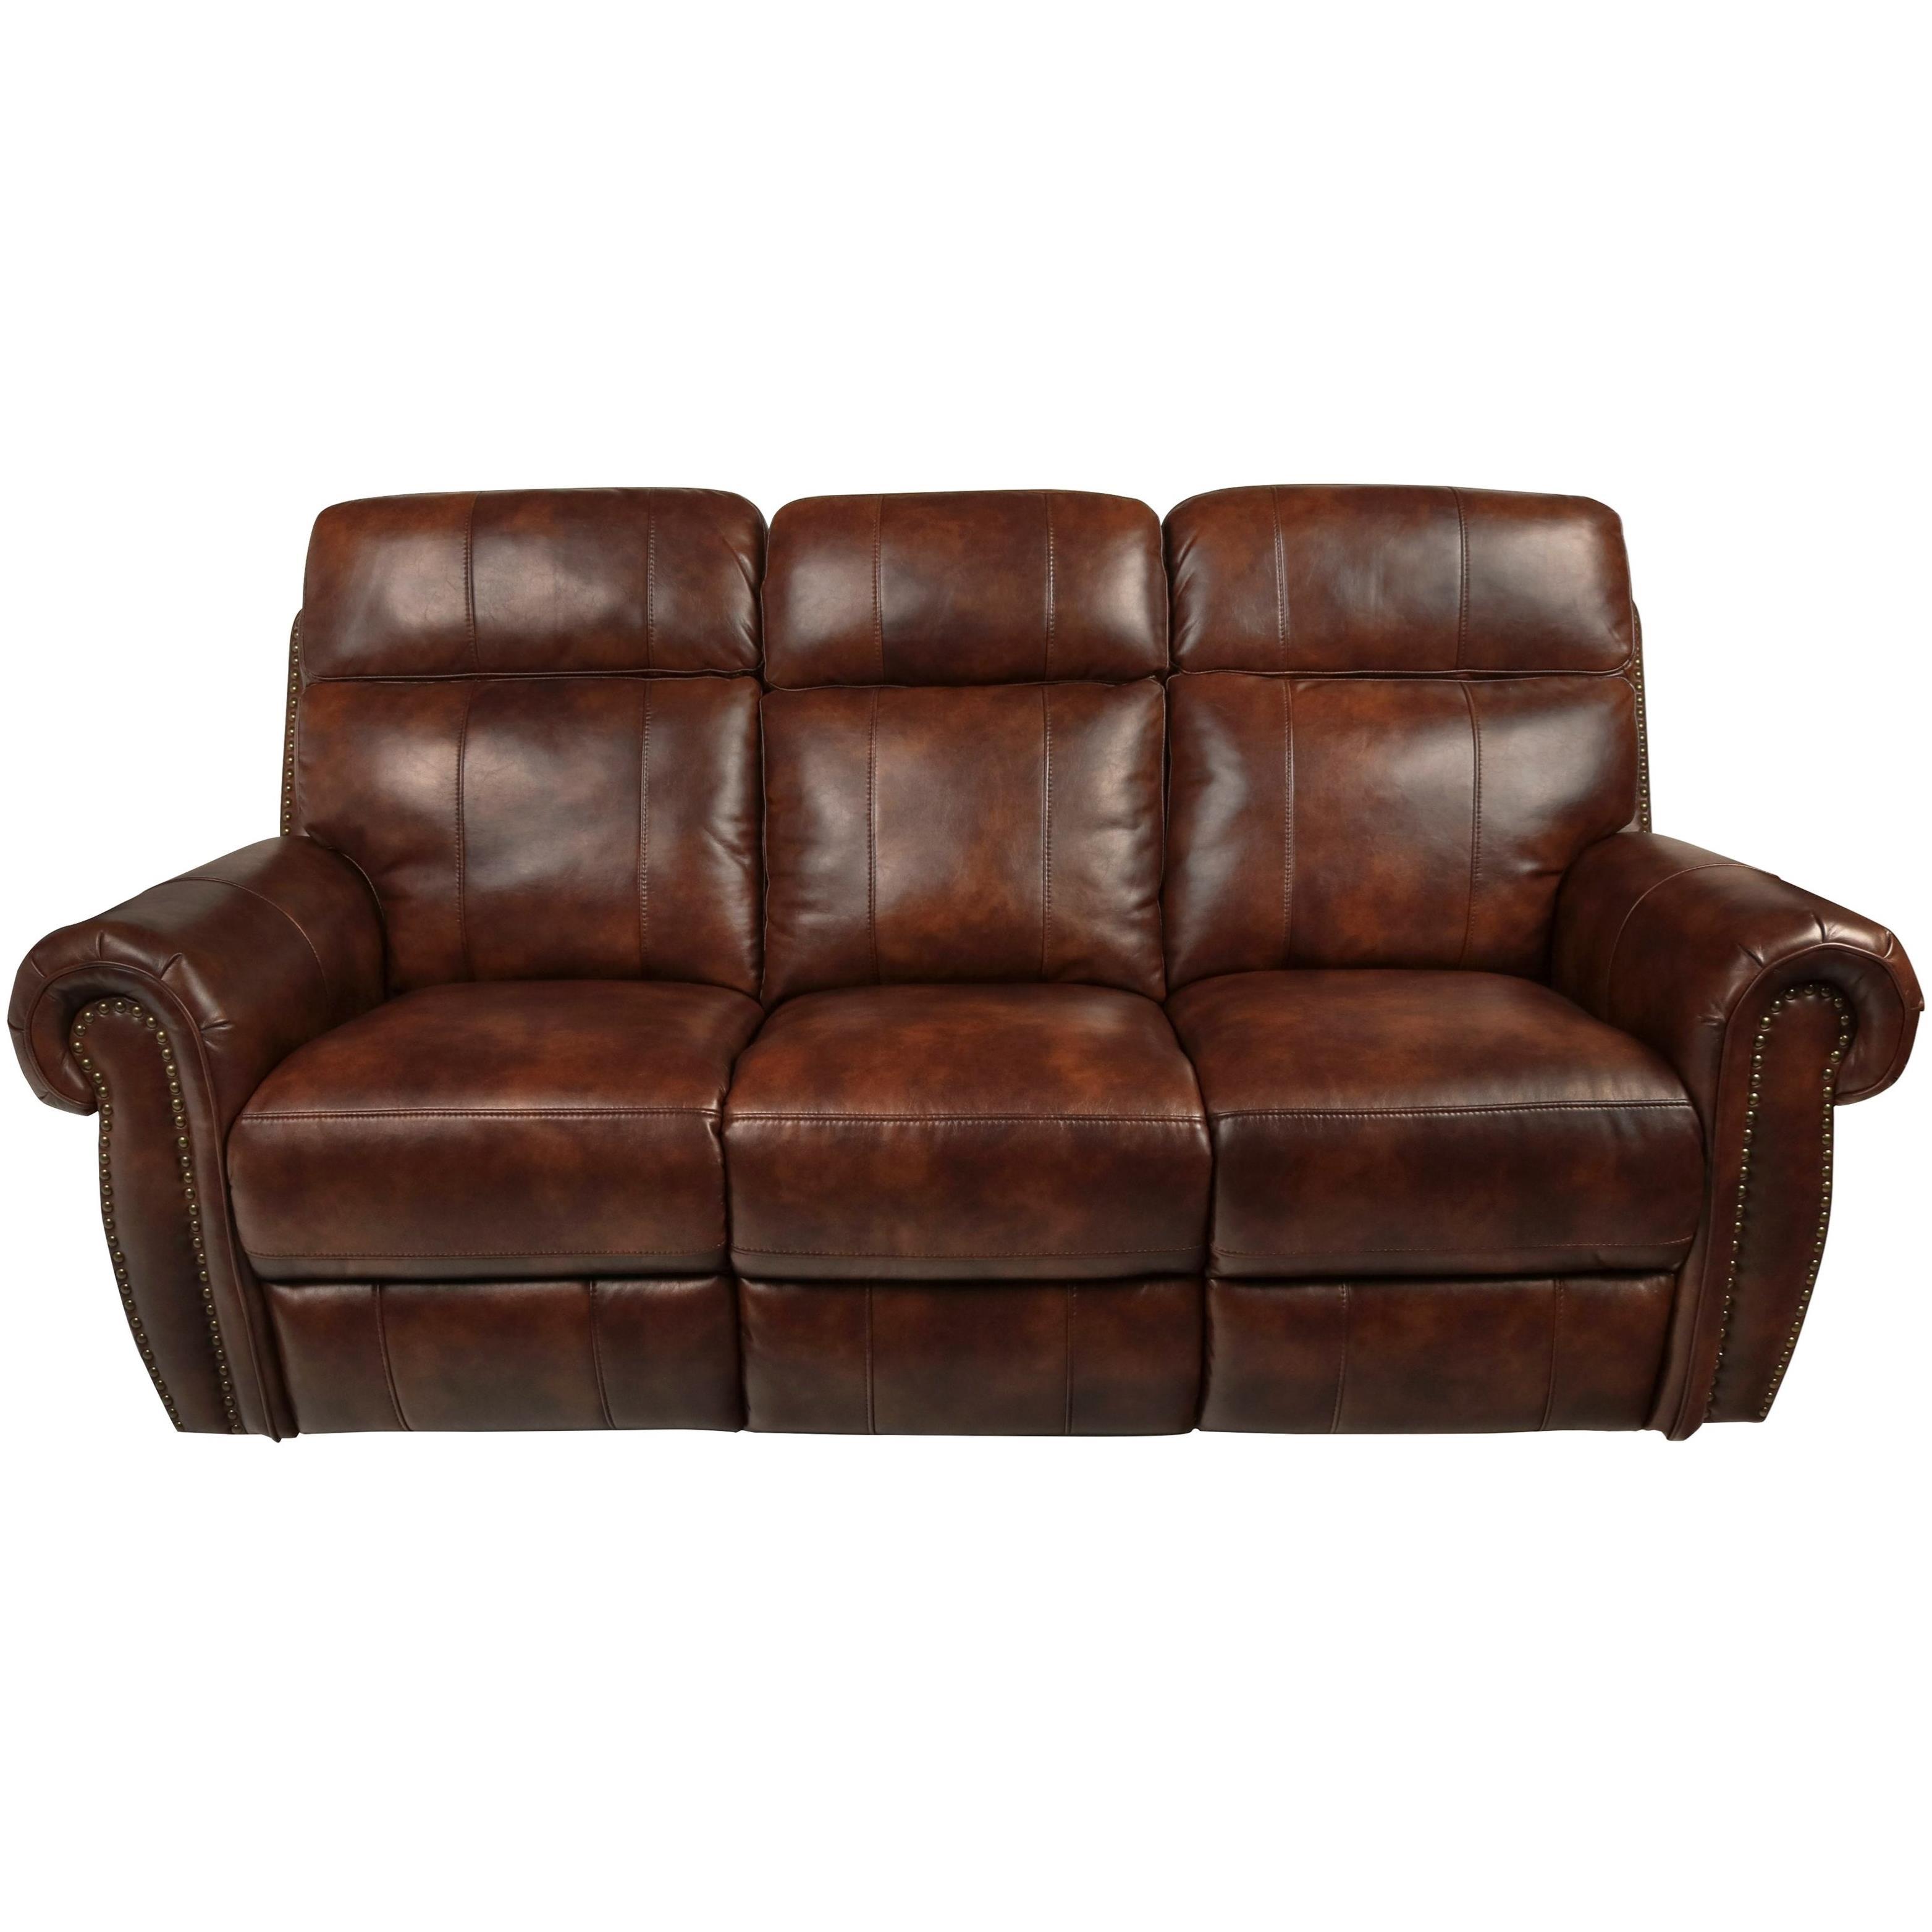 New Classic RoycroftPower Reclining Sofa ...